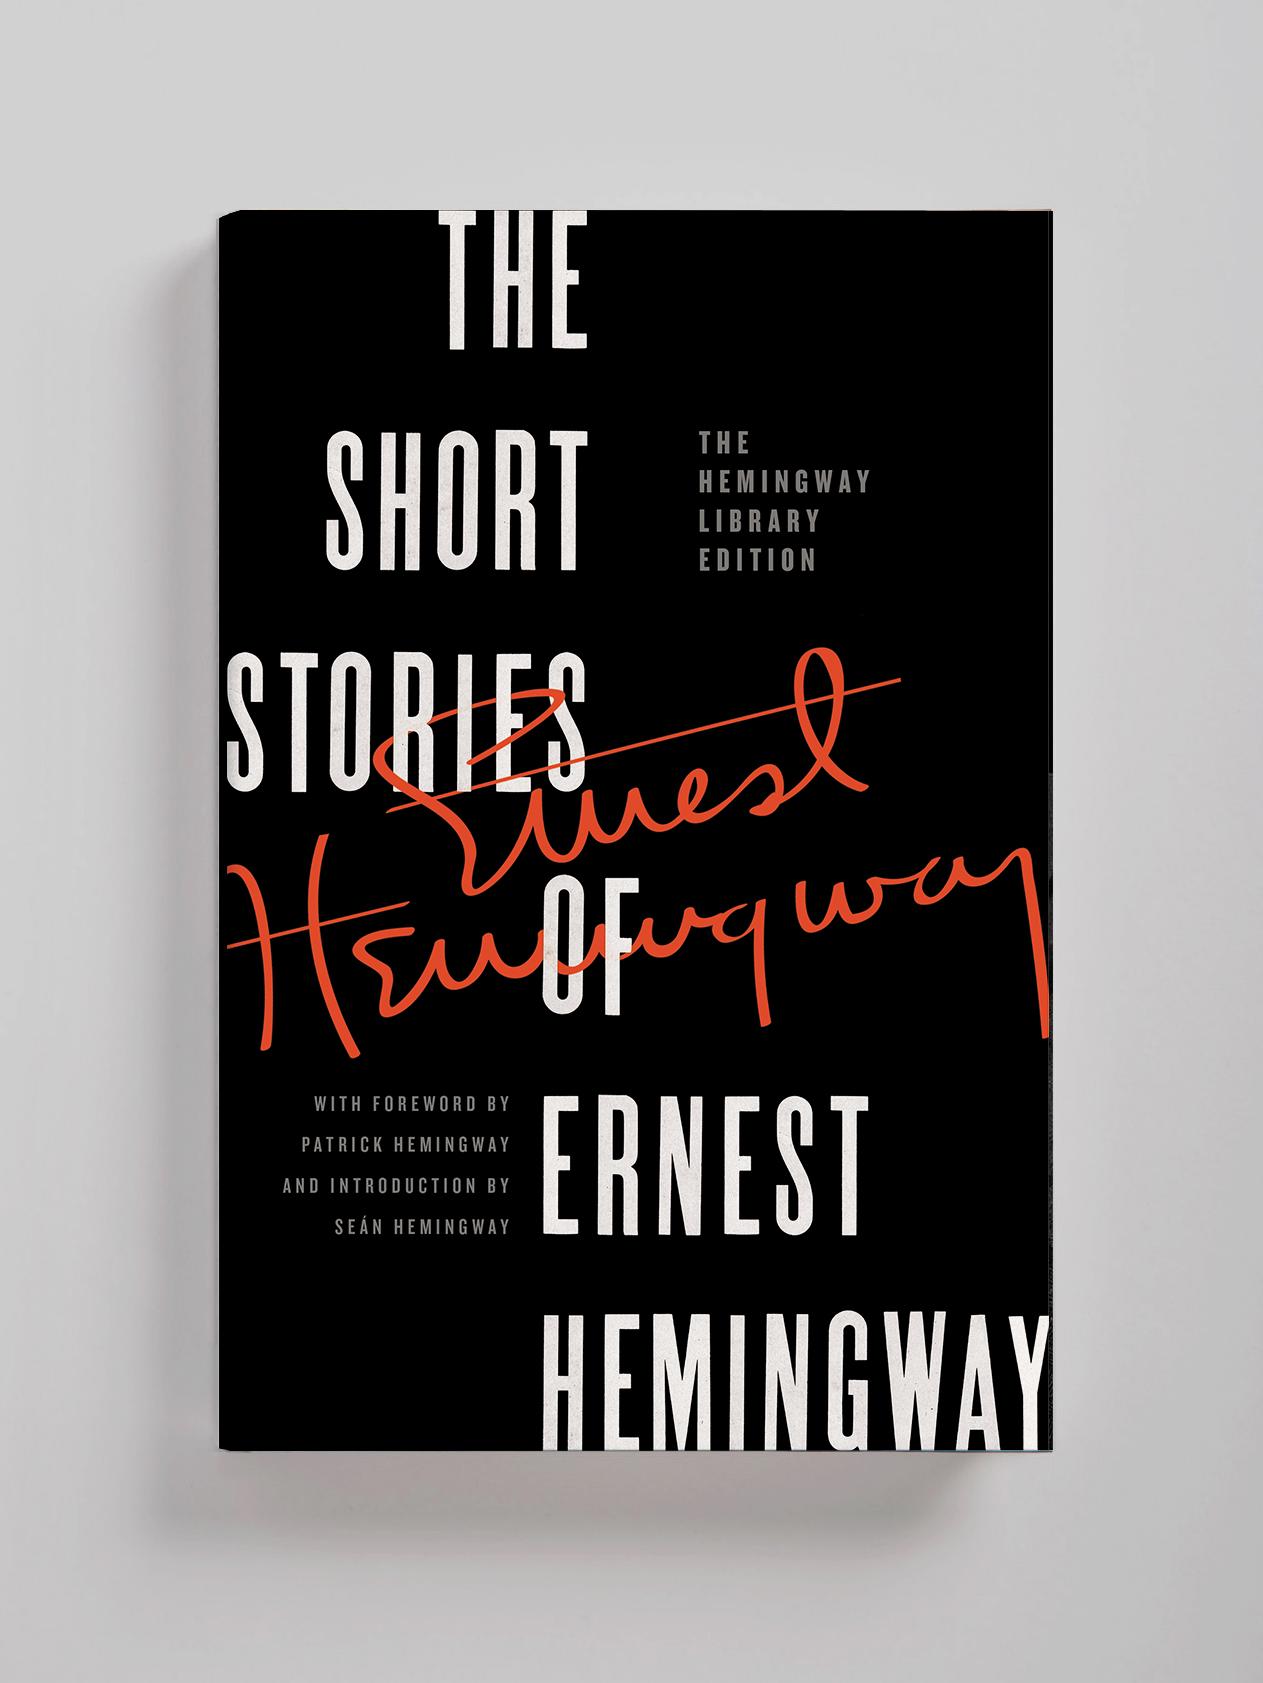 Lauren Peters-Collaer—The Short Stories of Ernest Hemingway unused